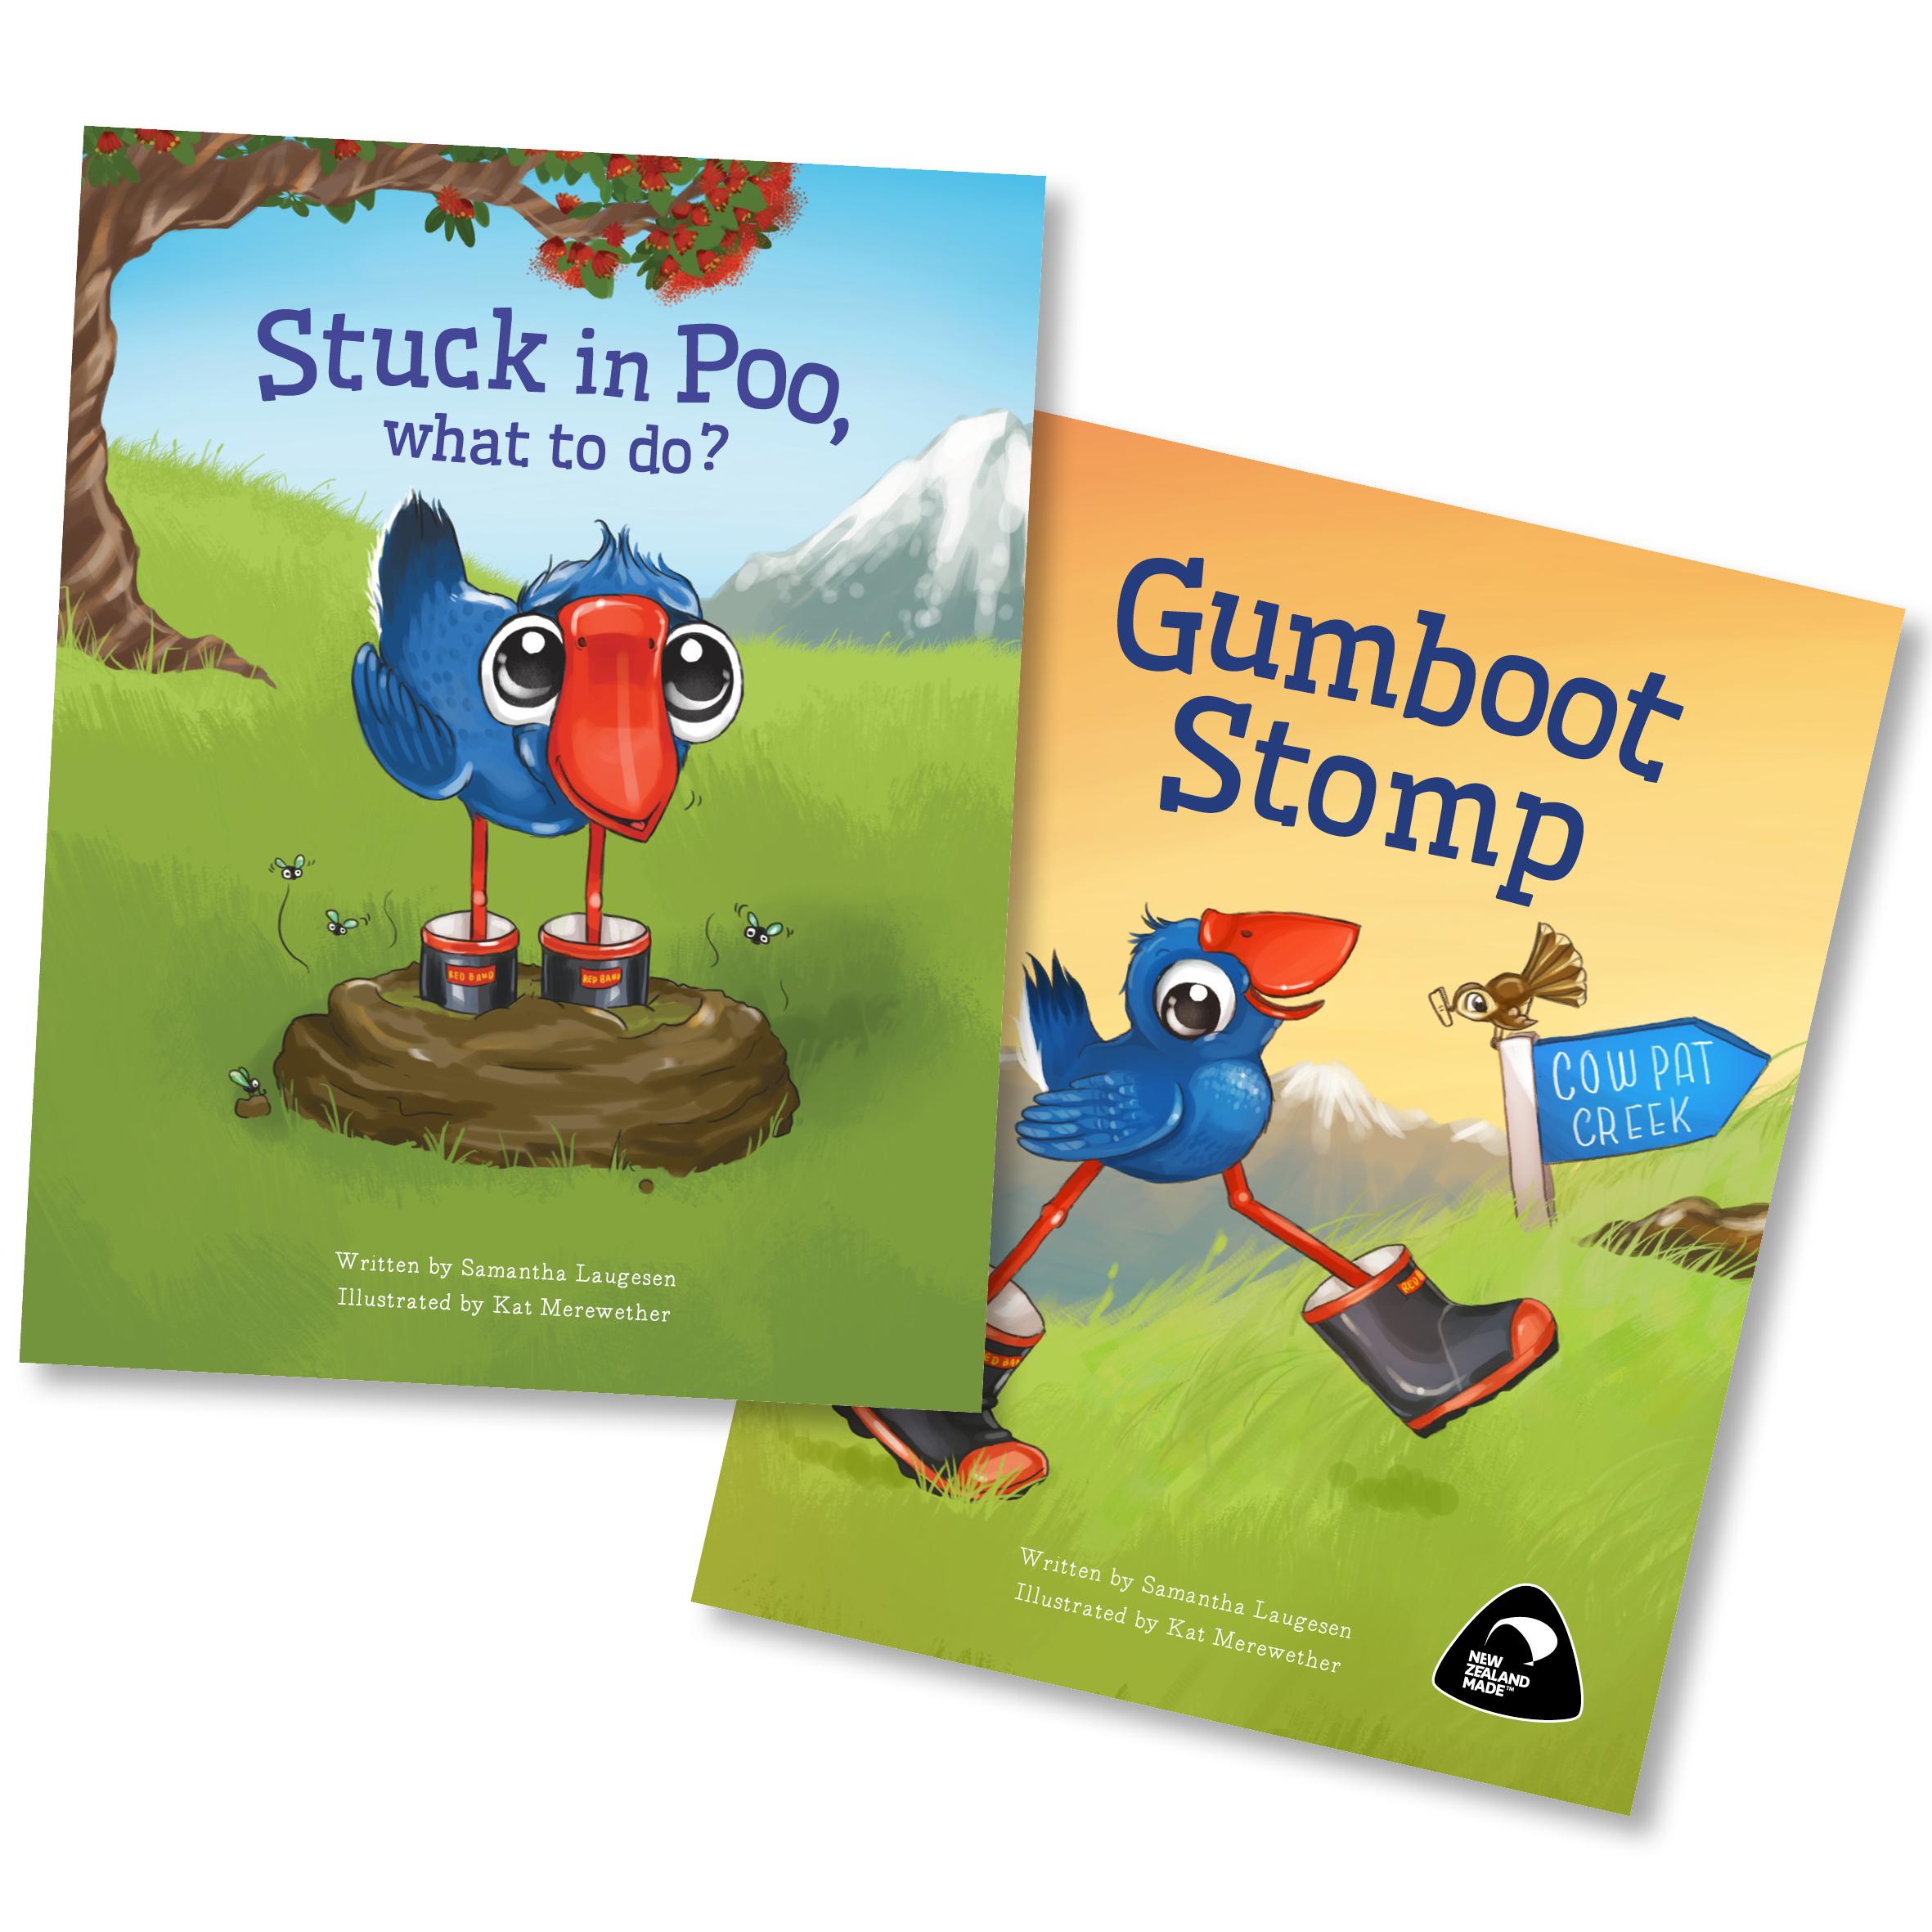 Luke the Pook Series - Author - Samantha LaugesenIllustrations and Design - Kat Merewether